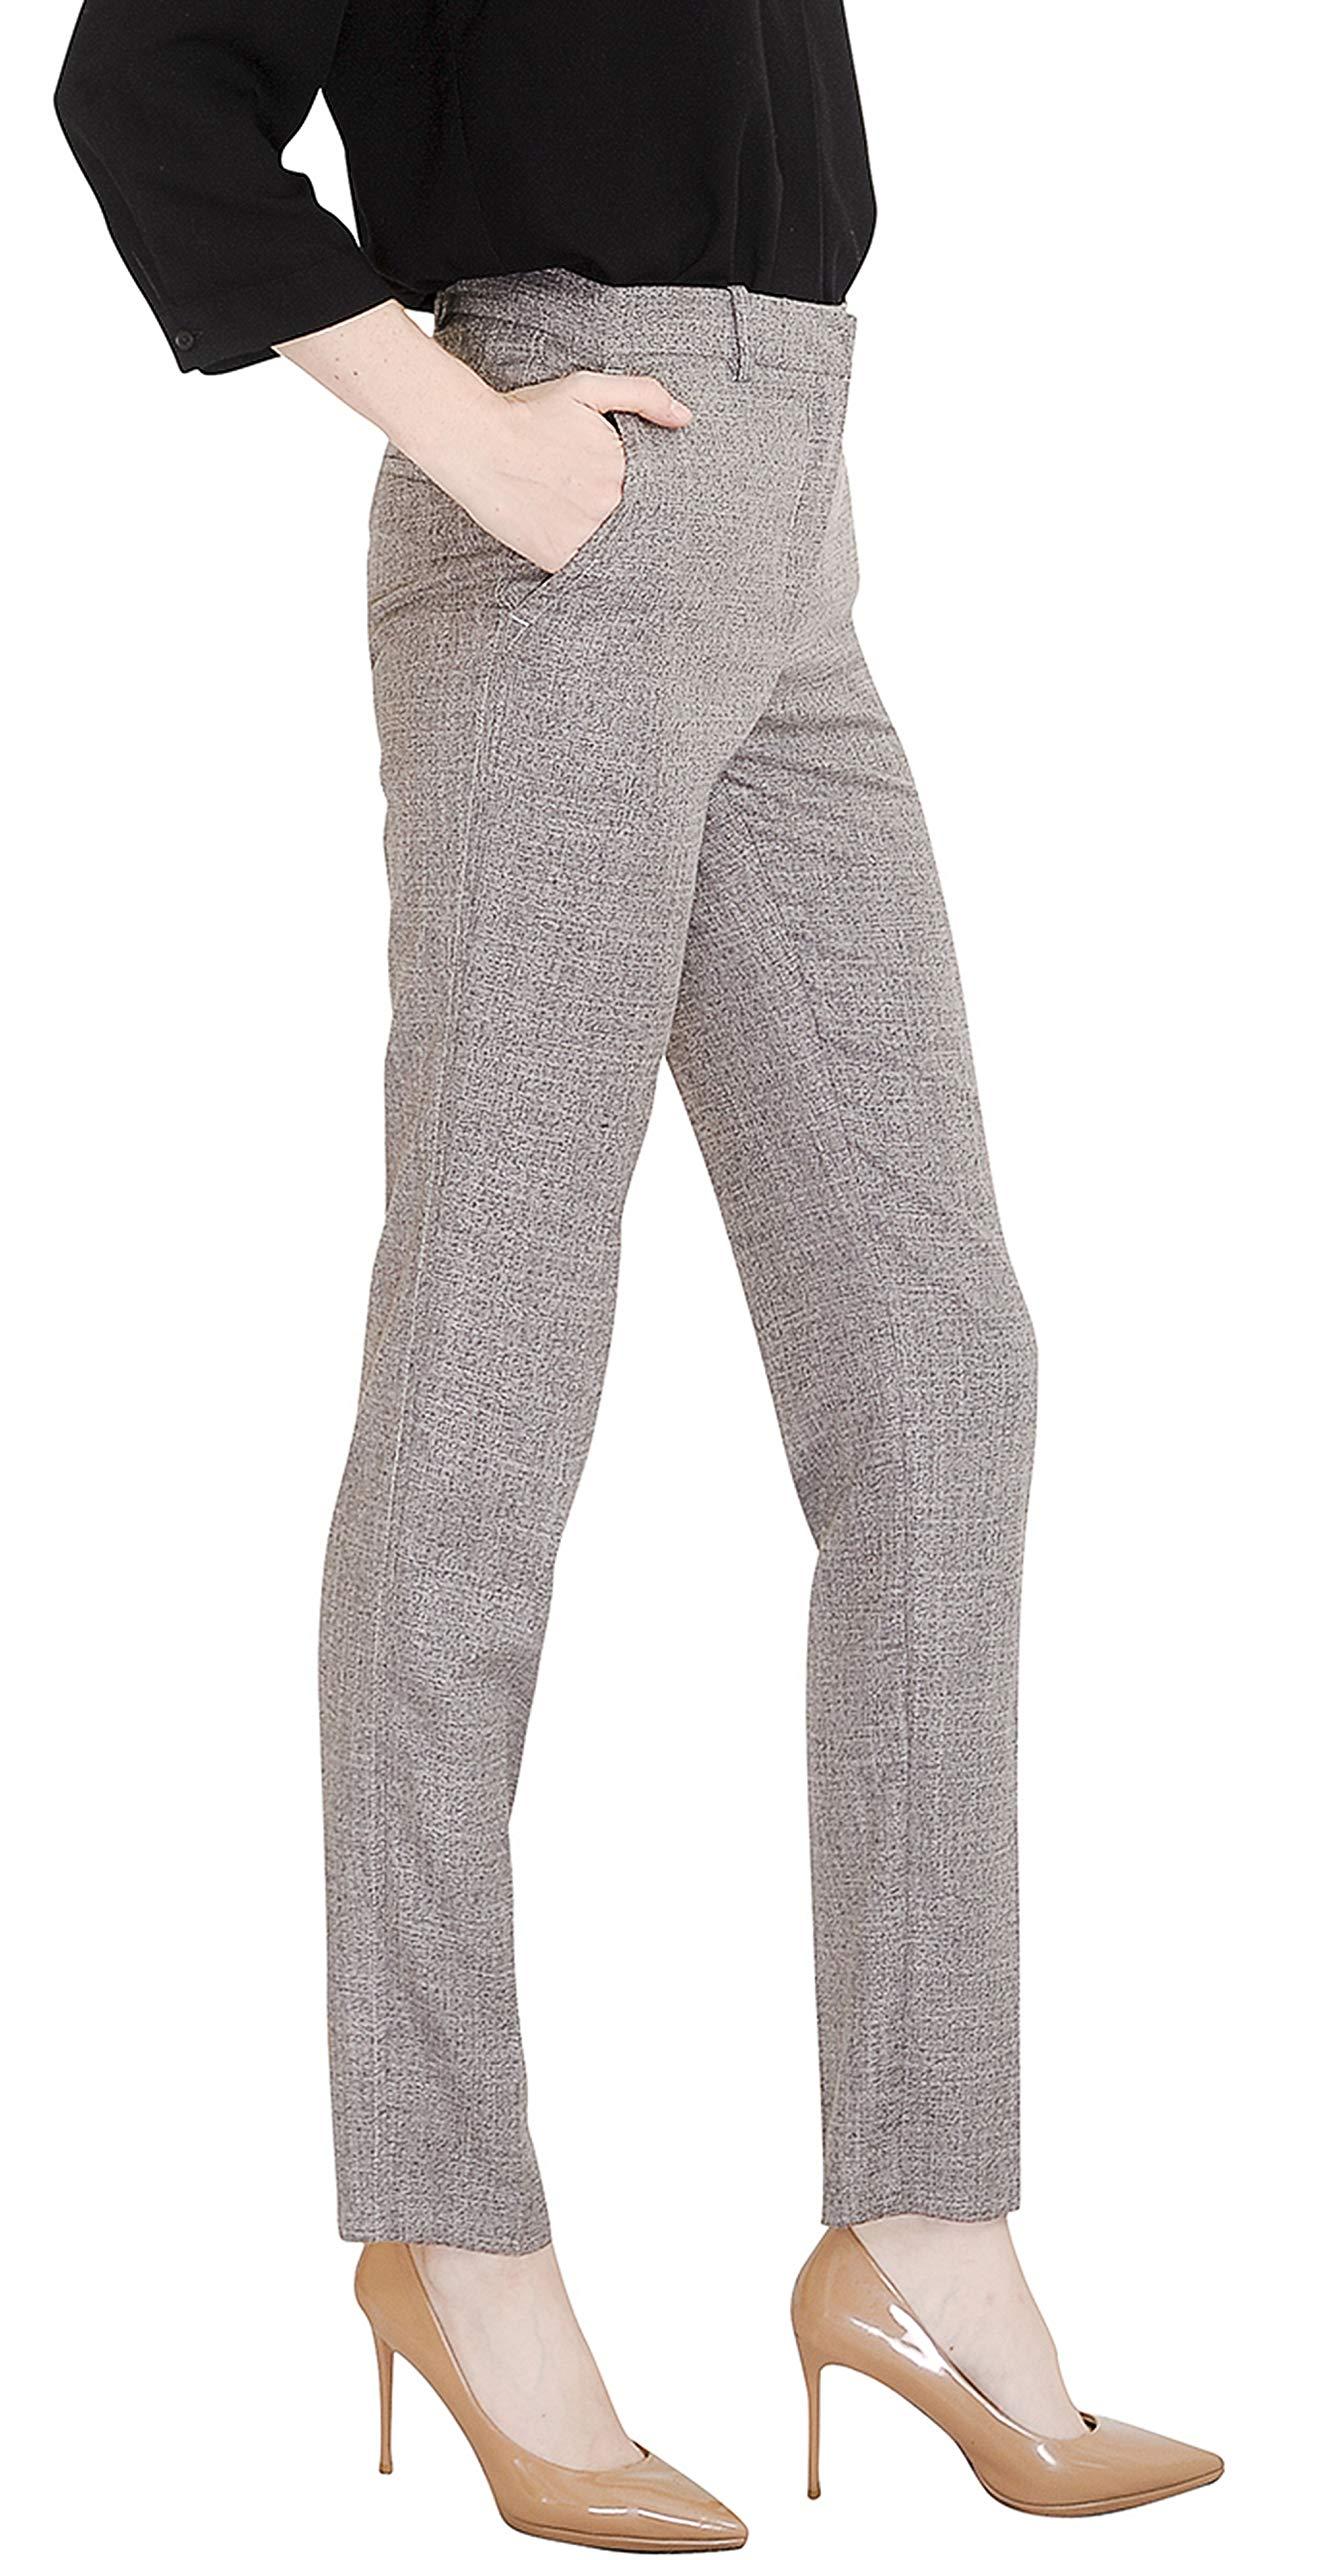 Marycrafts Women's Office Work Dress Slacks Pants Trousers Tall